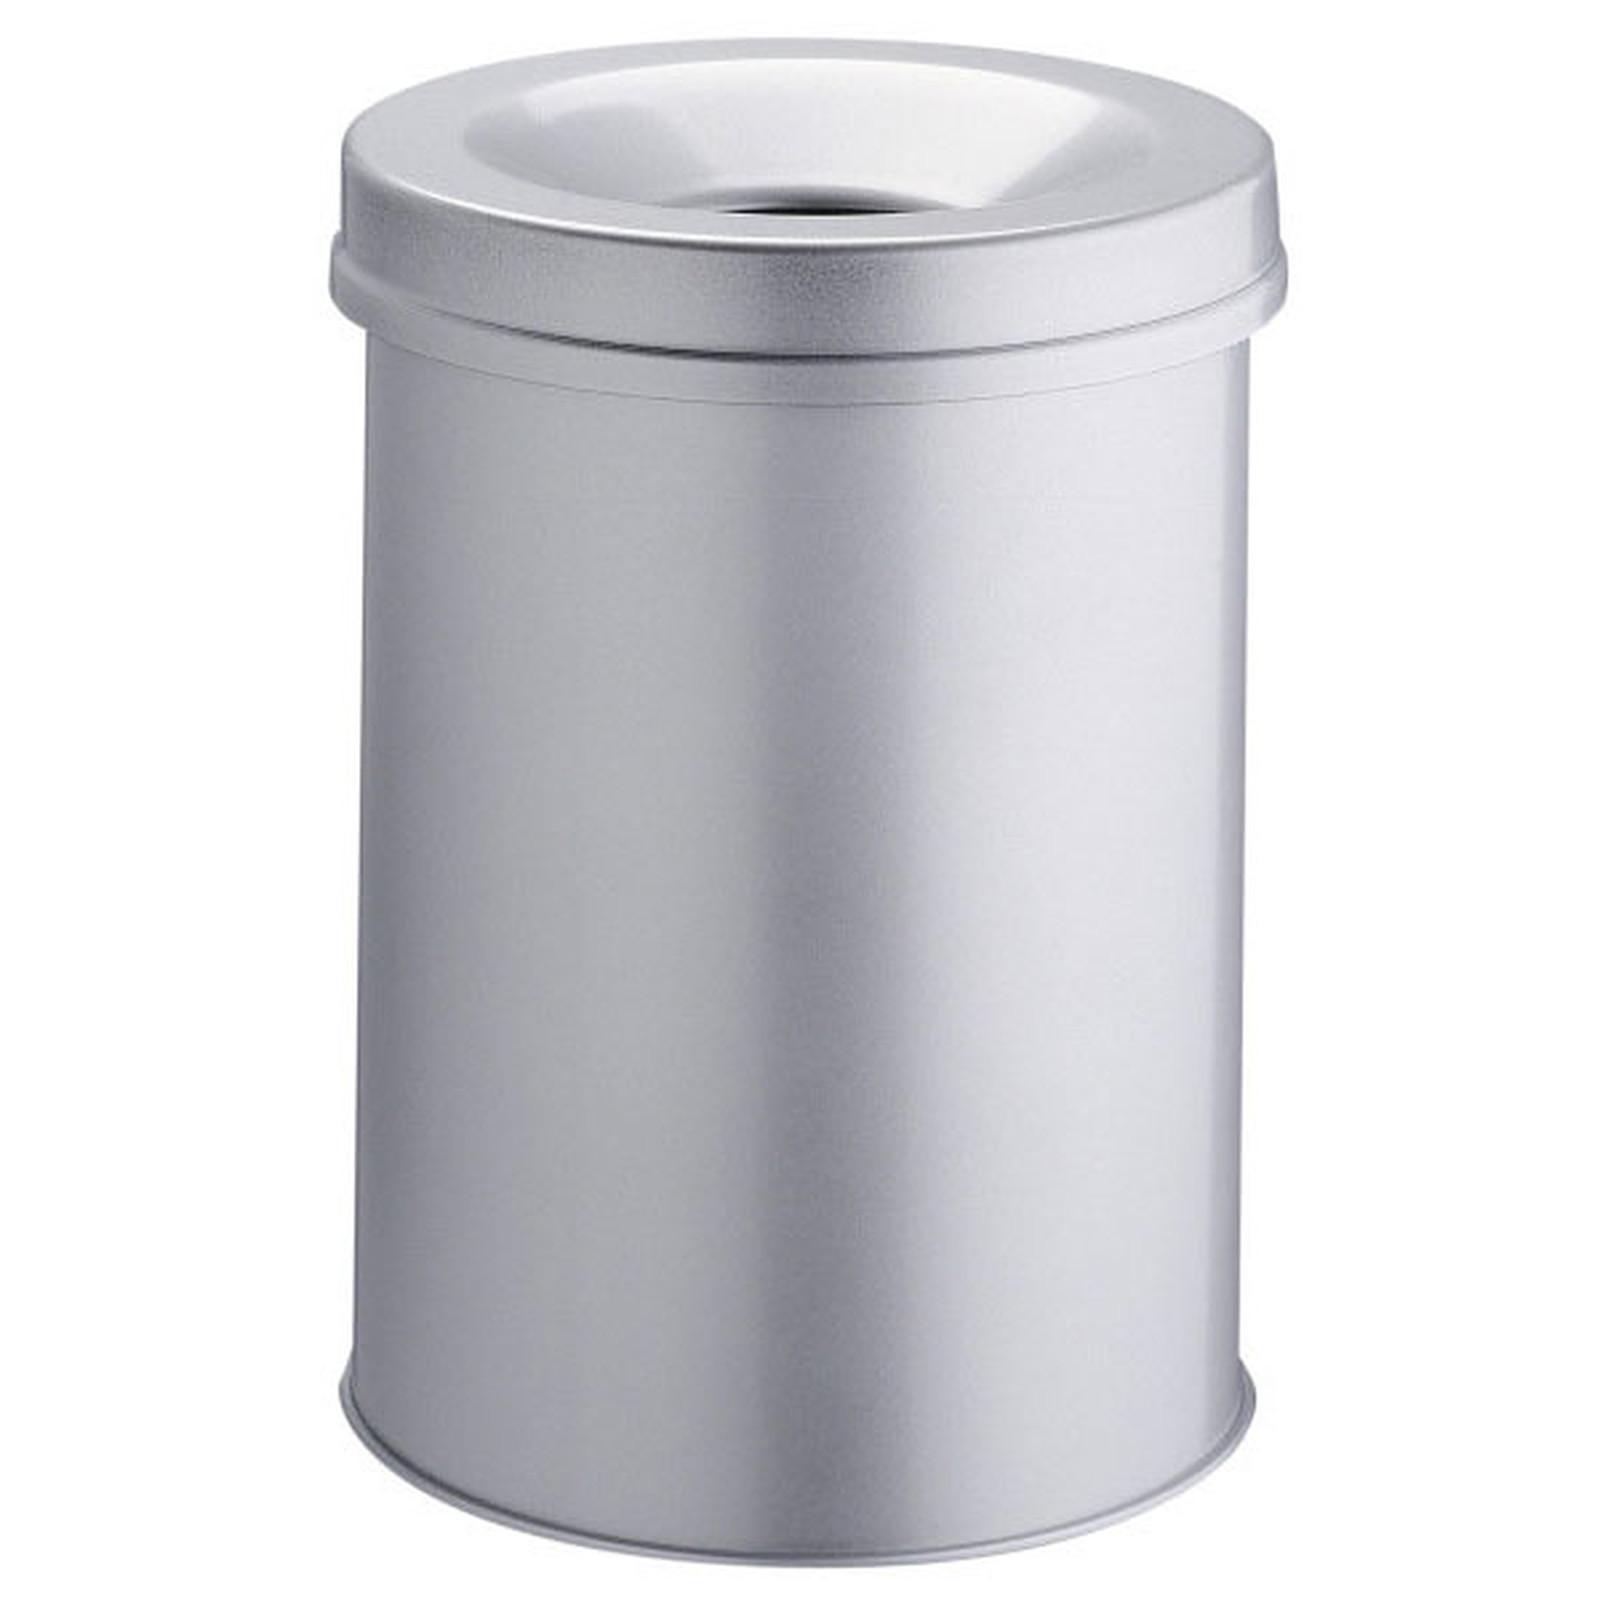 DURABLE Corbeille anti-feu 30 litres Gris